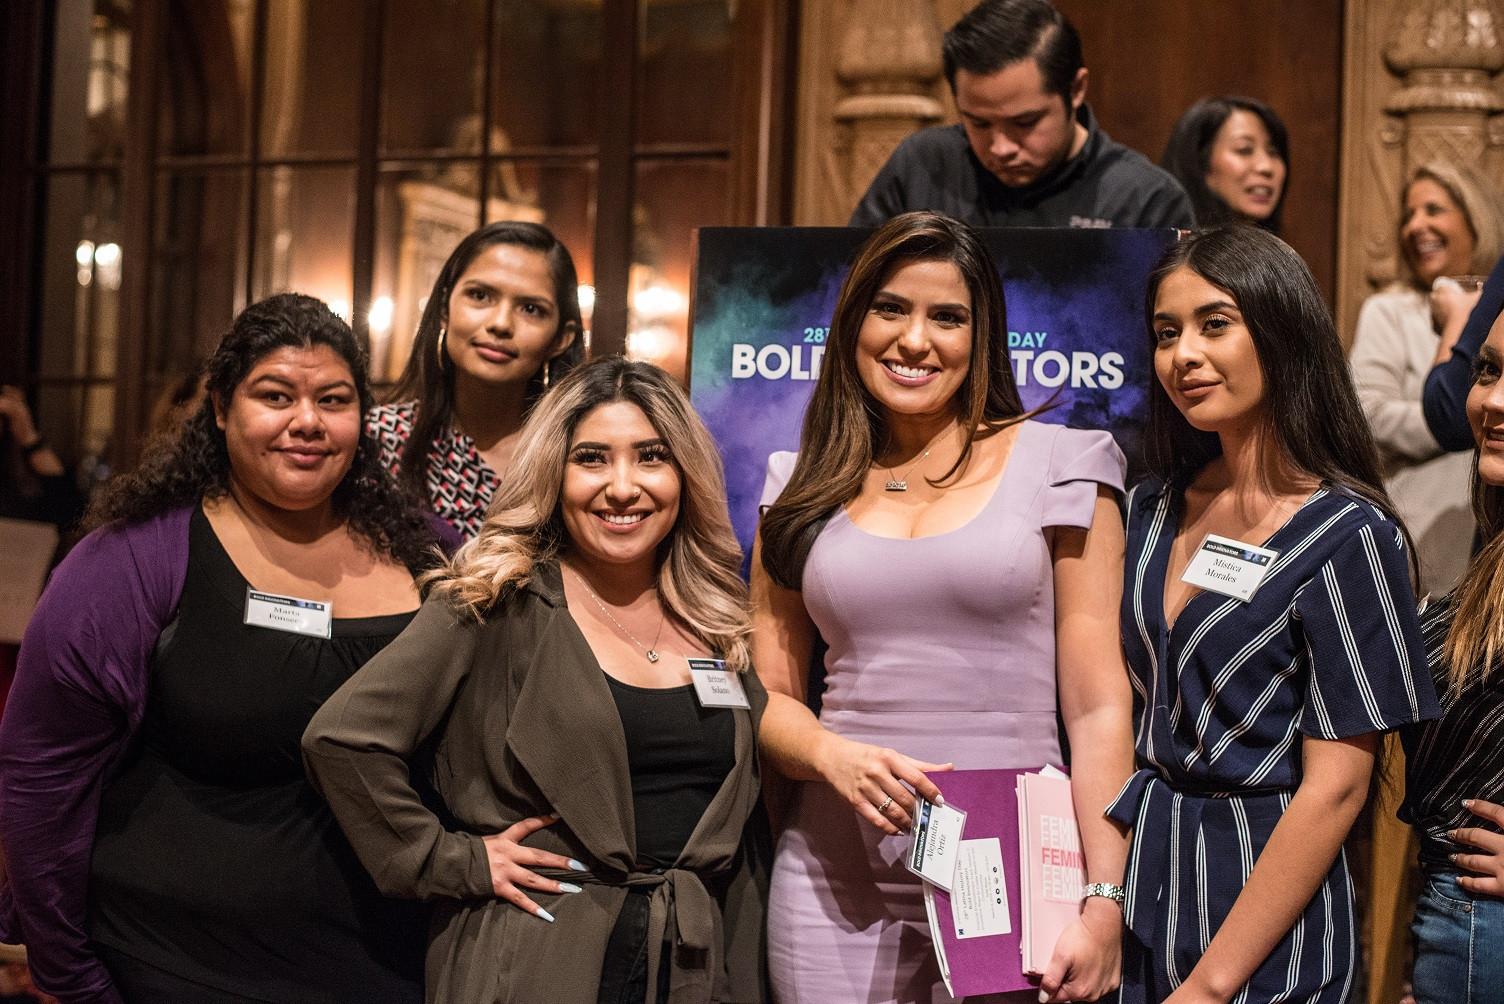 Moderator Alejandra Ortiz of Telemundo52 with conference attendees